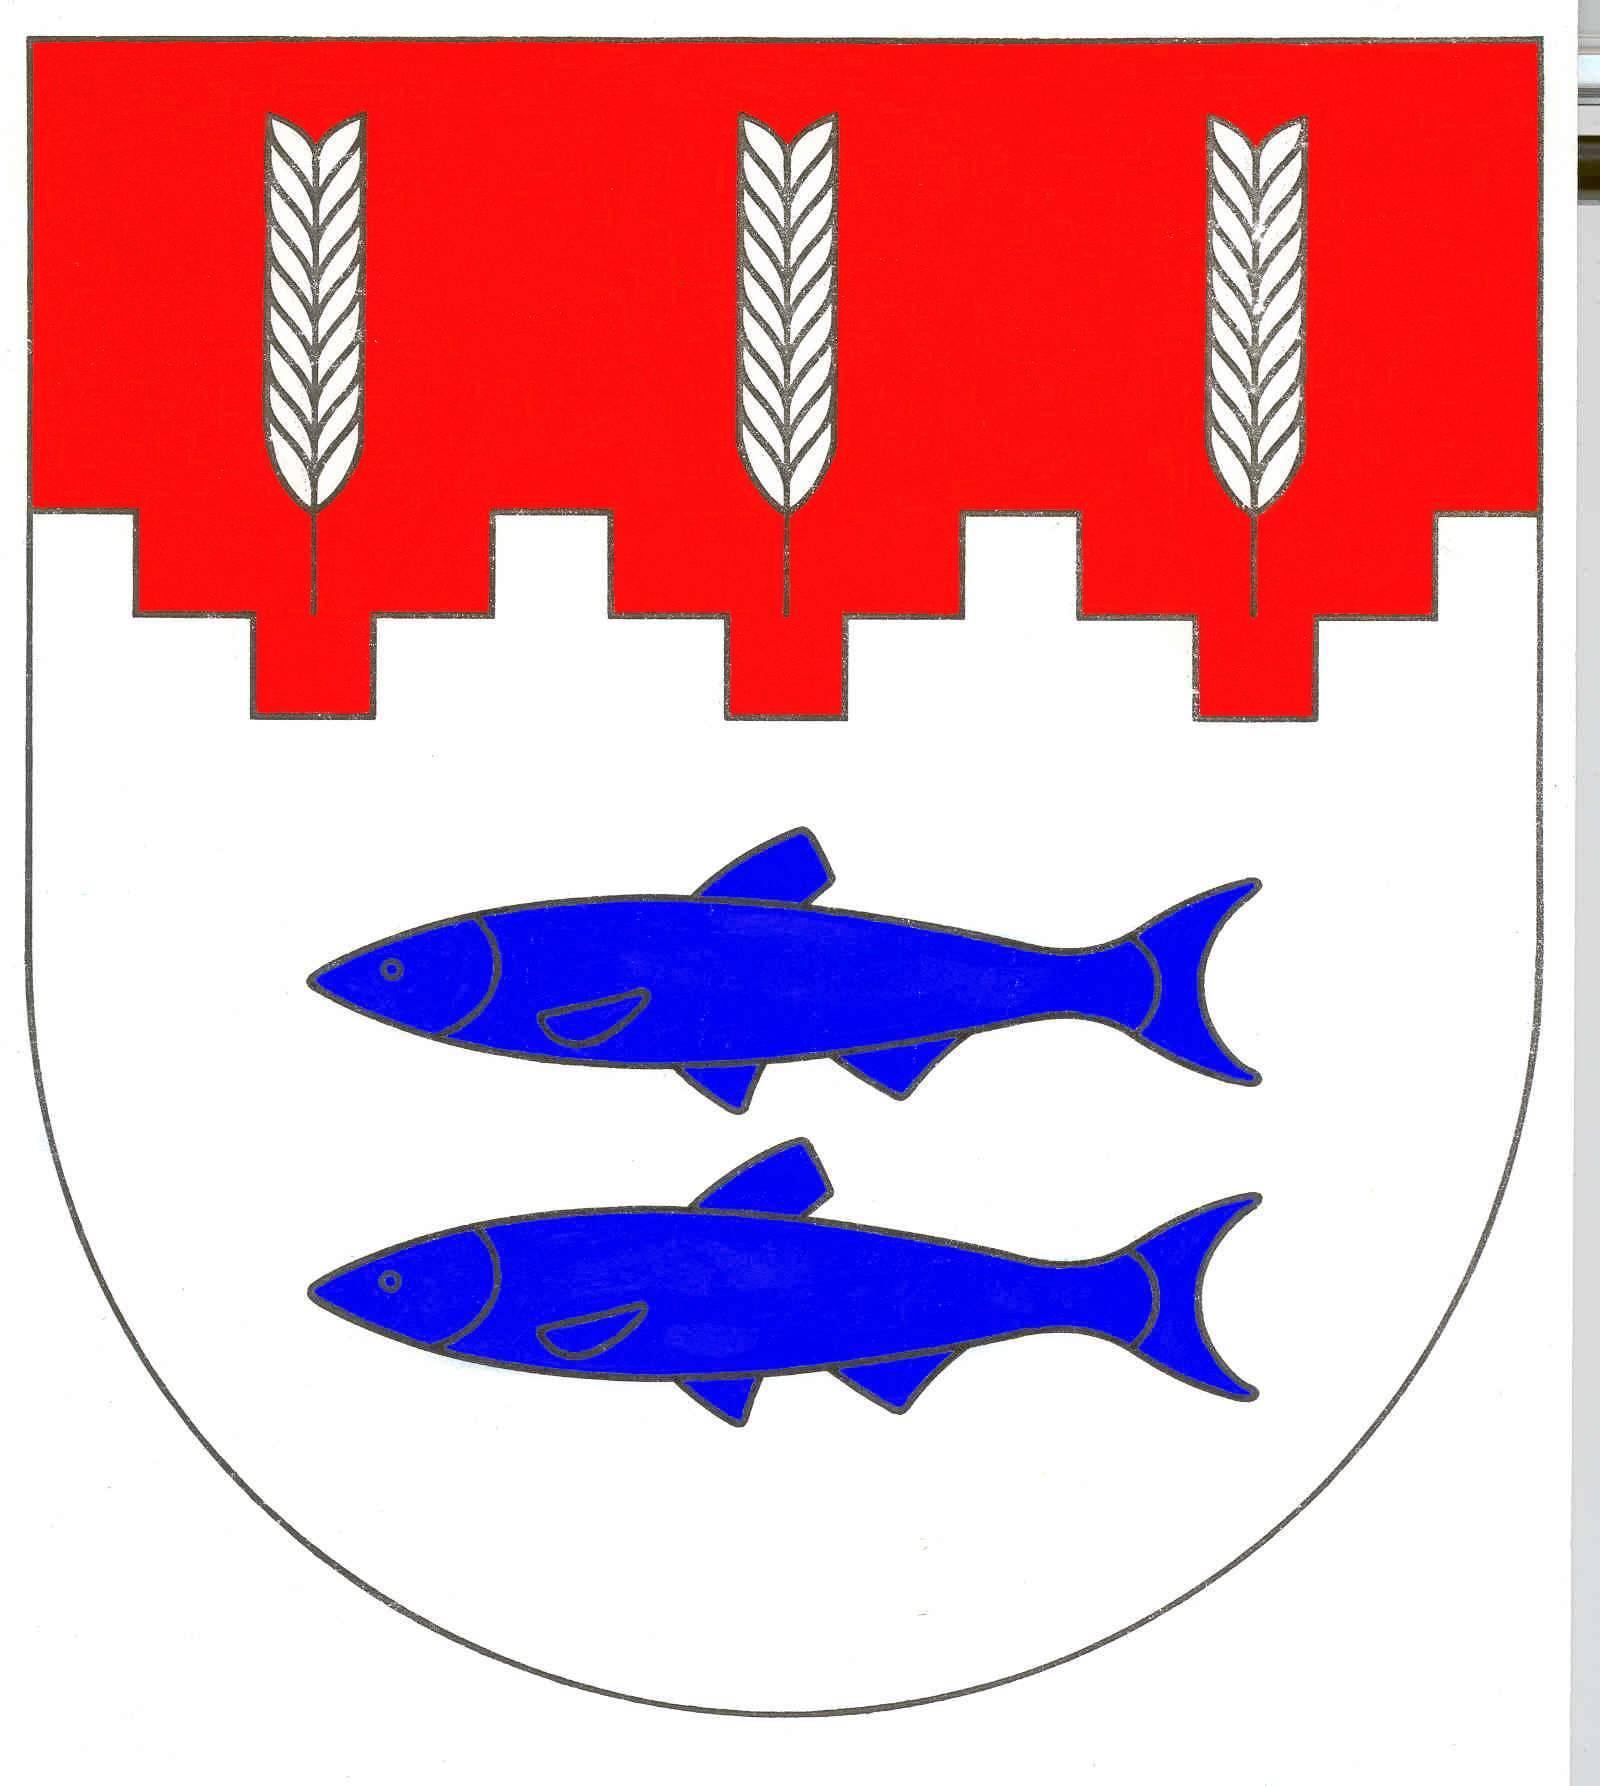 Wappen GemeindeSchülldorf, Kreis Rendsburg-Eckernförde